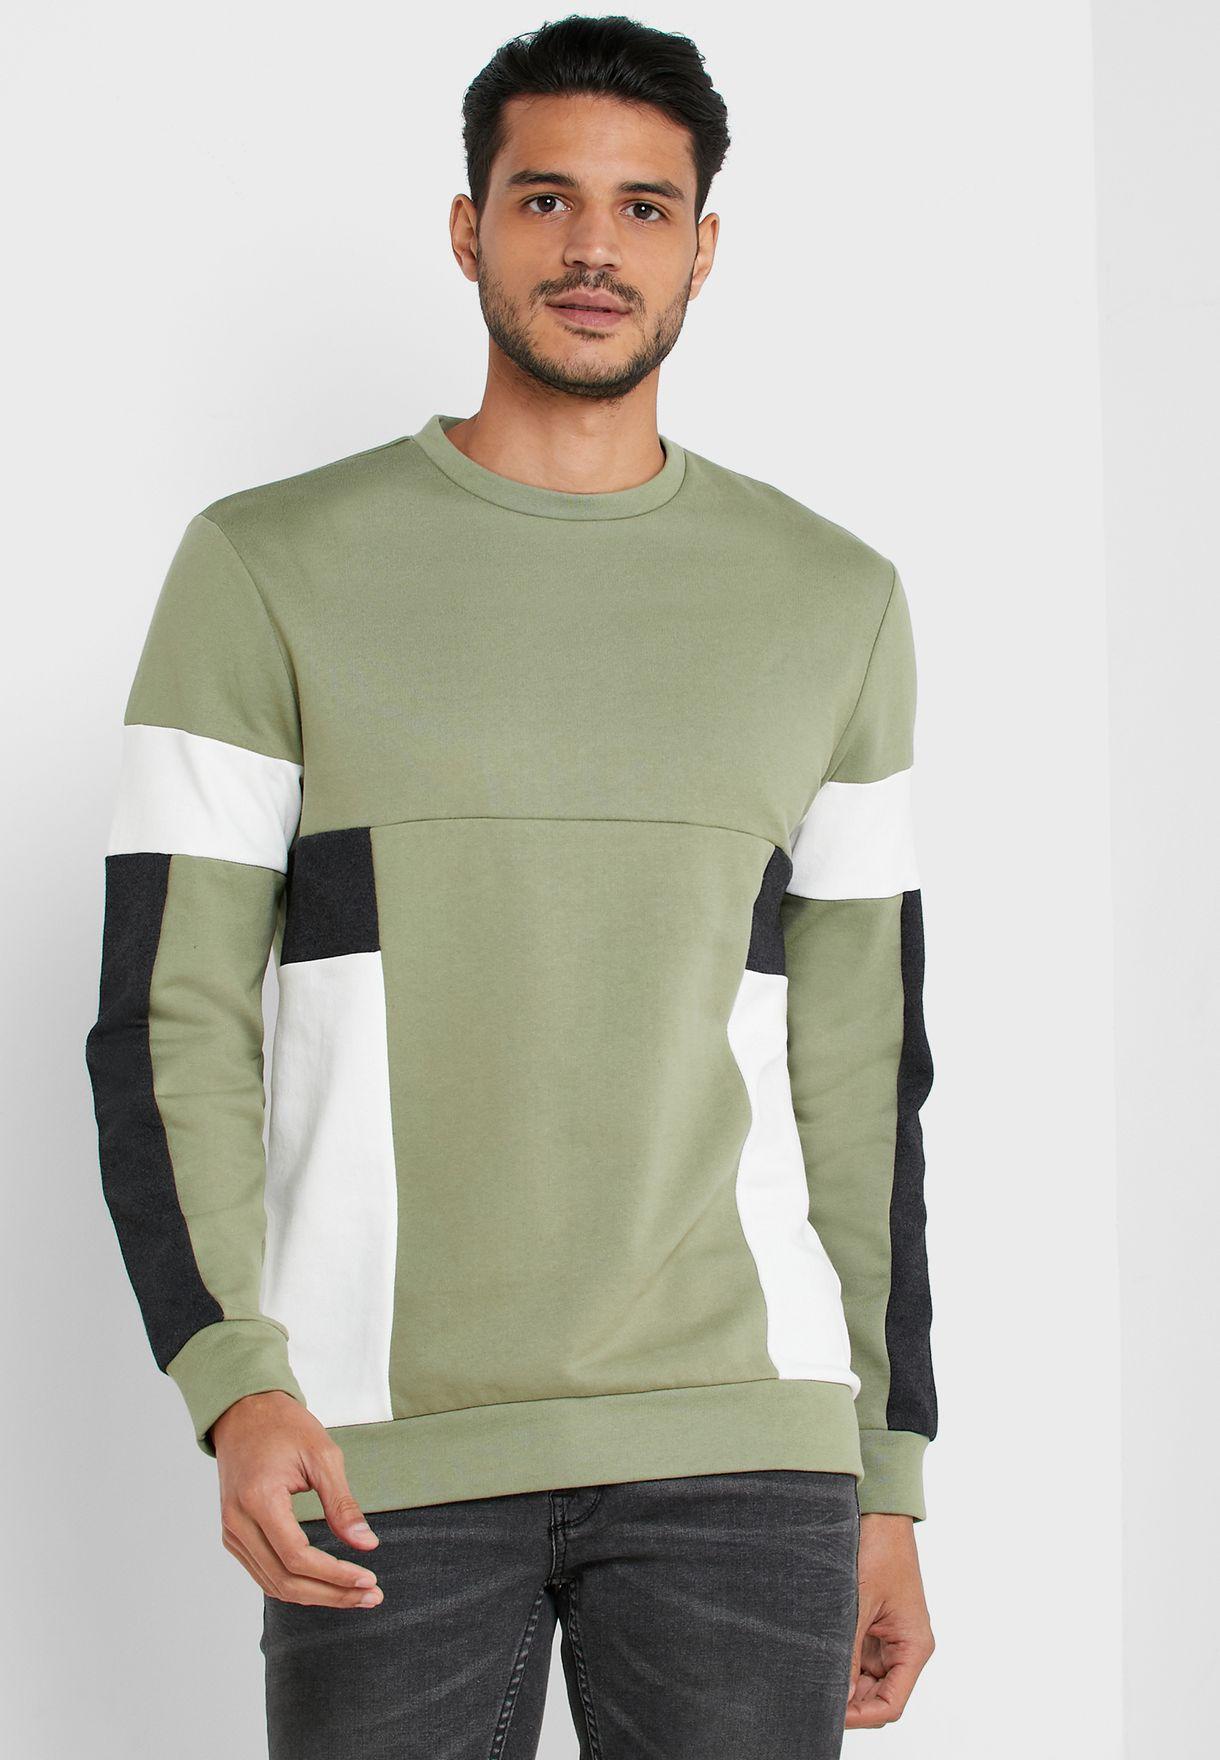 Mdustin Color Block Sweatshirt